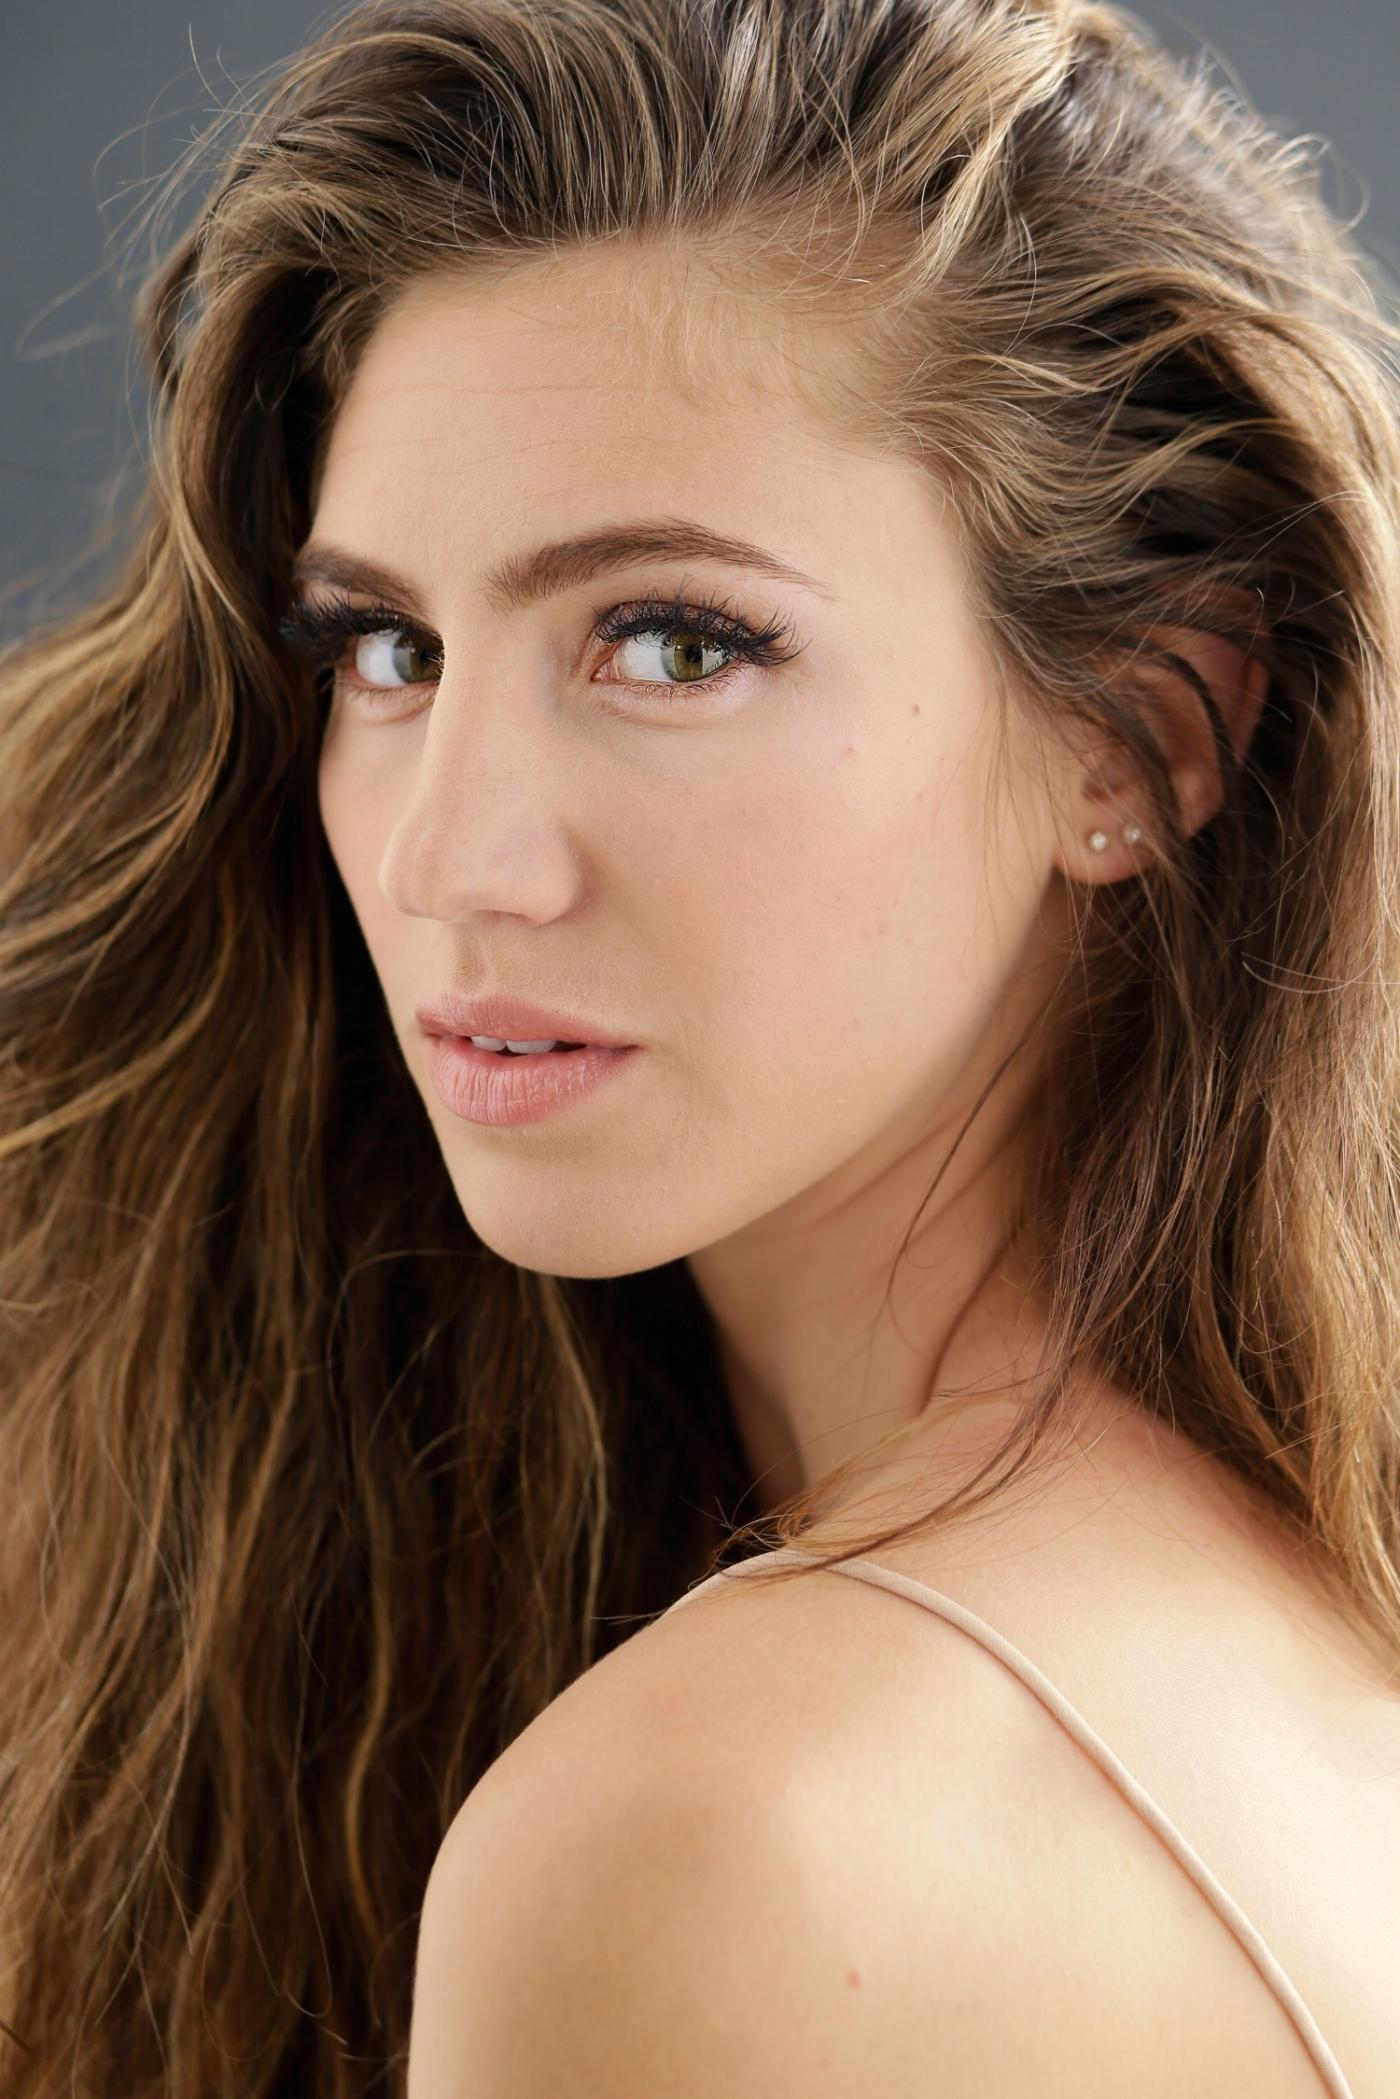 Lara Pictet - ProducerRebecca Blaine/Helen Blake